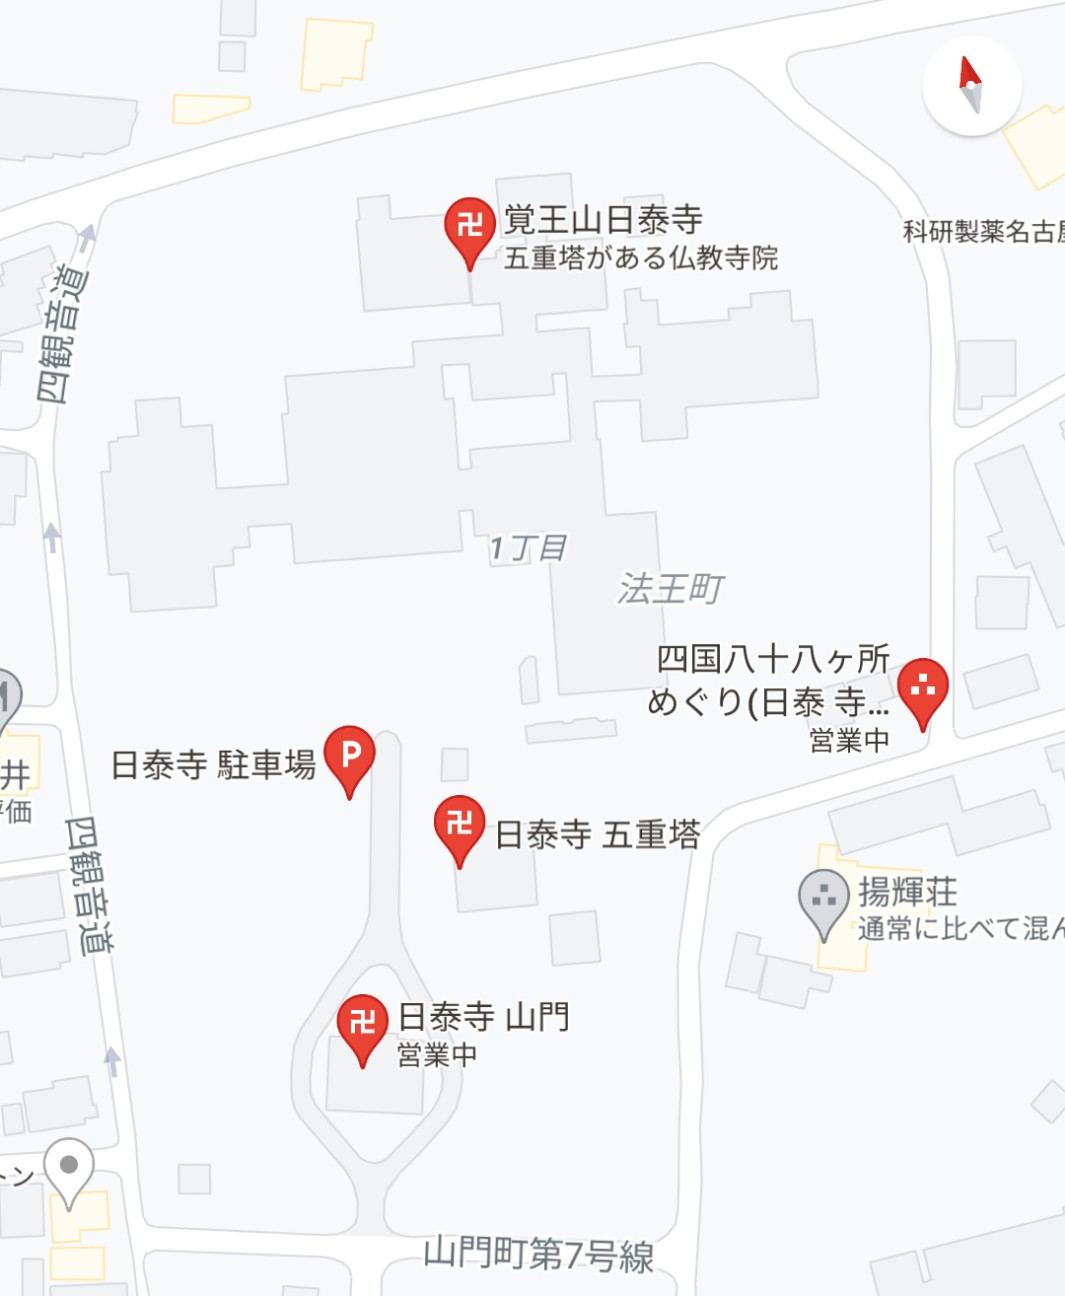 f:id:hinoki_kaonashi:20210924144334j:plain